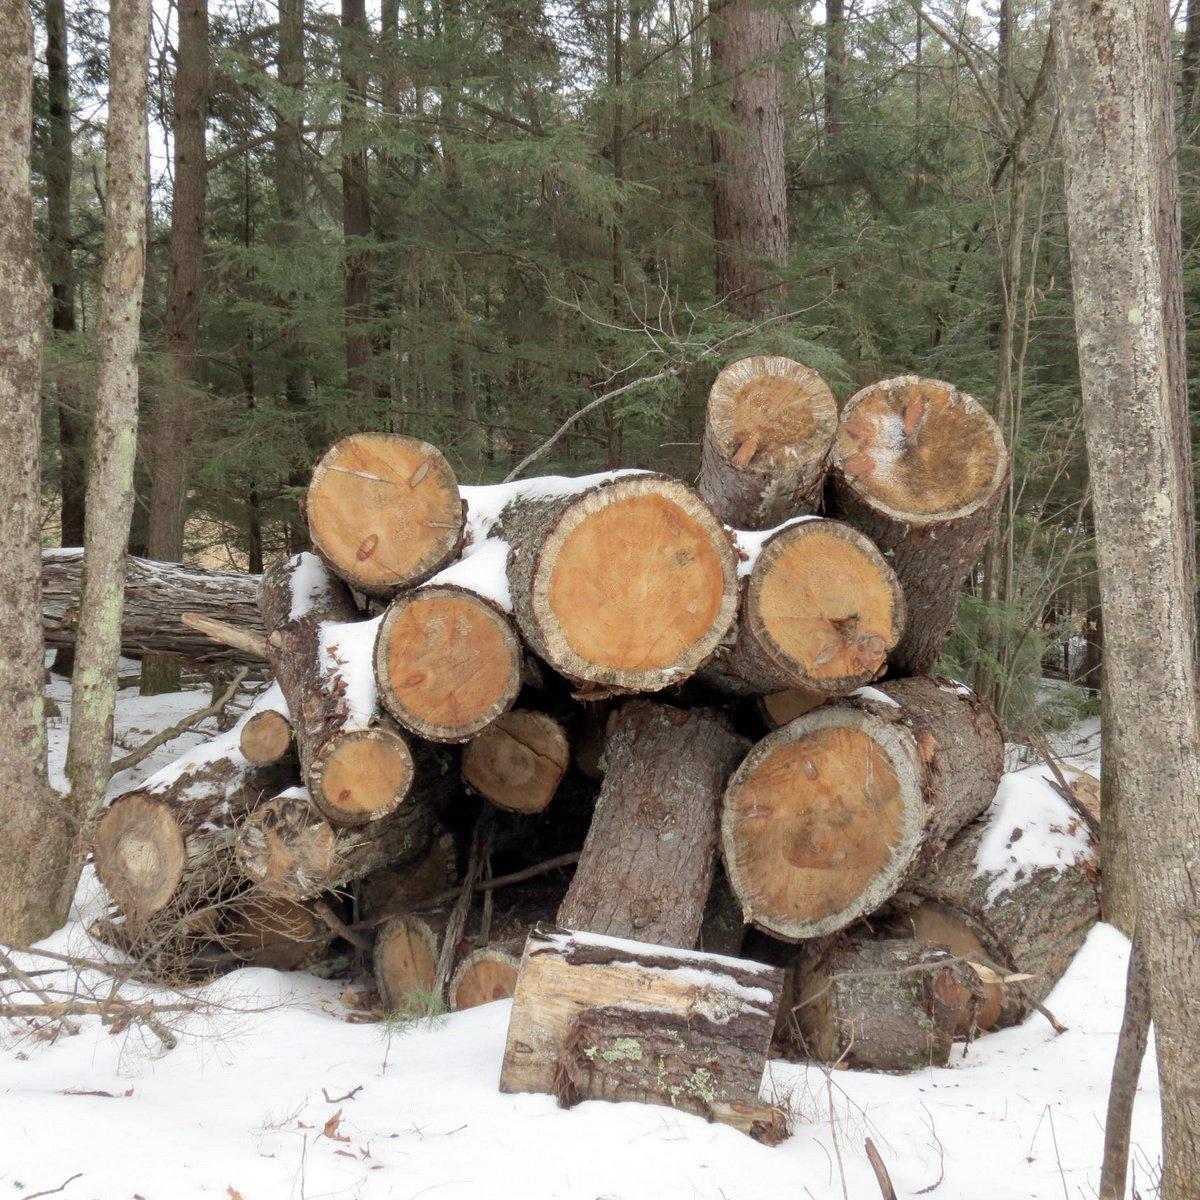 5. Log Pile